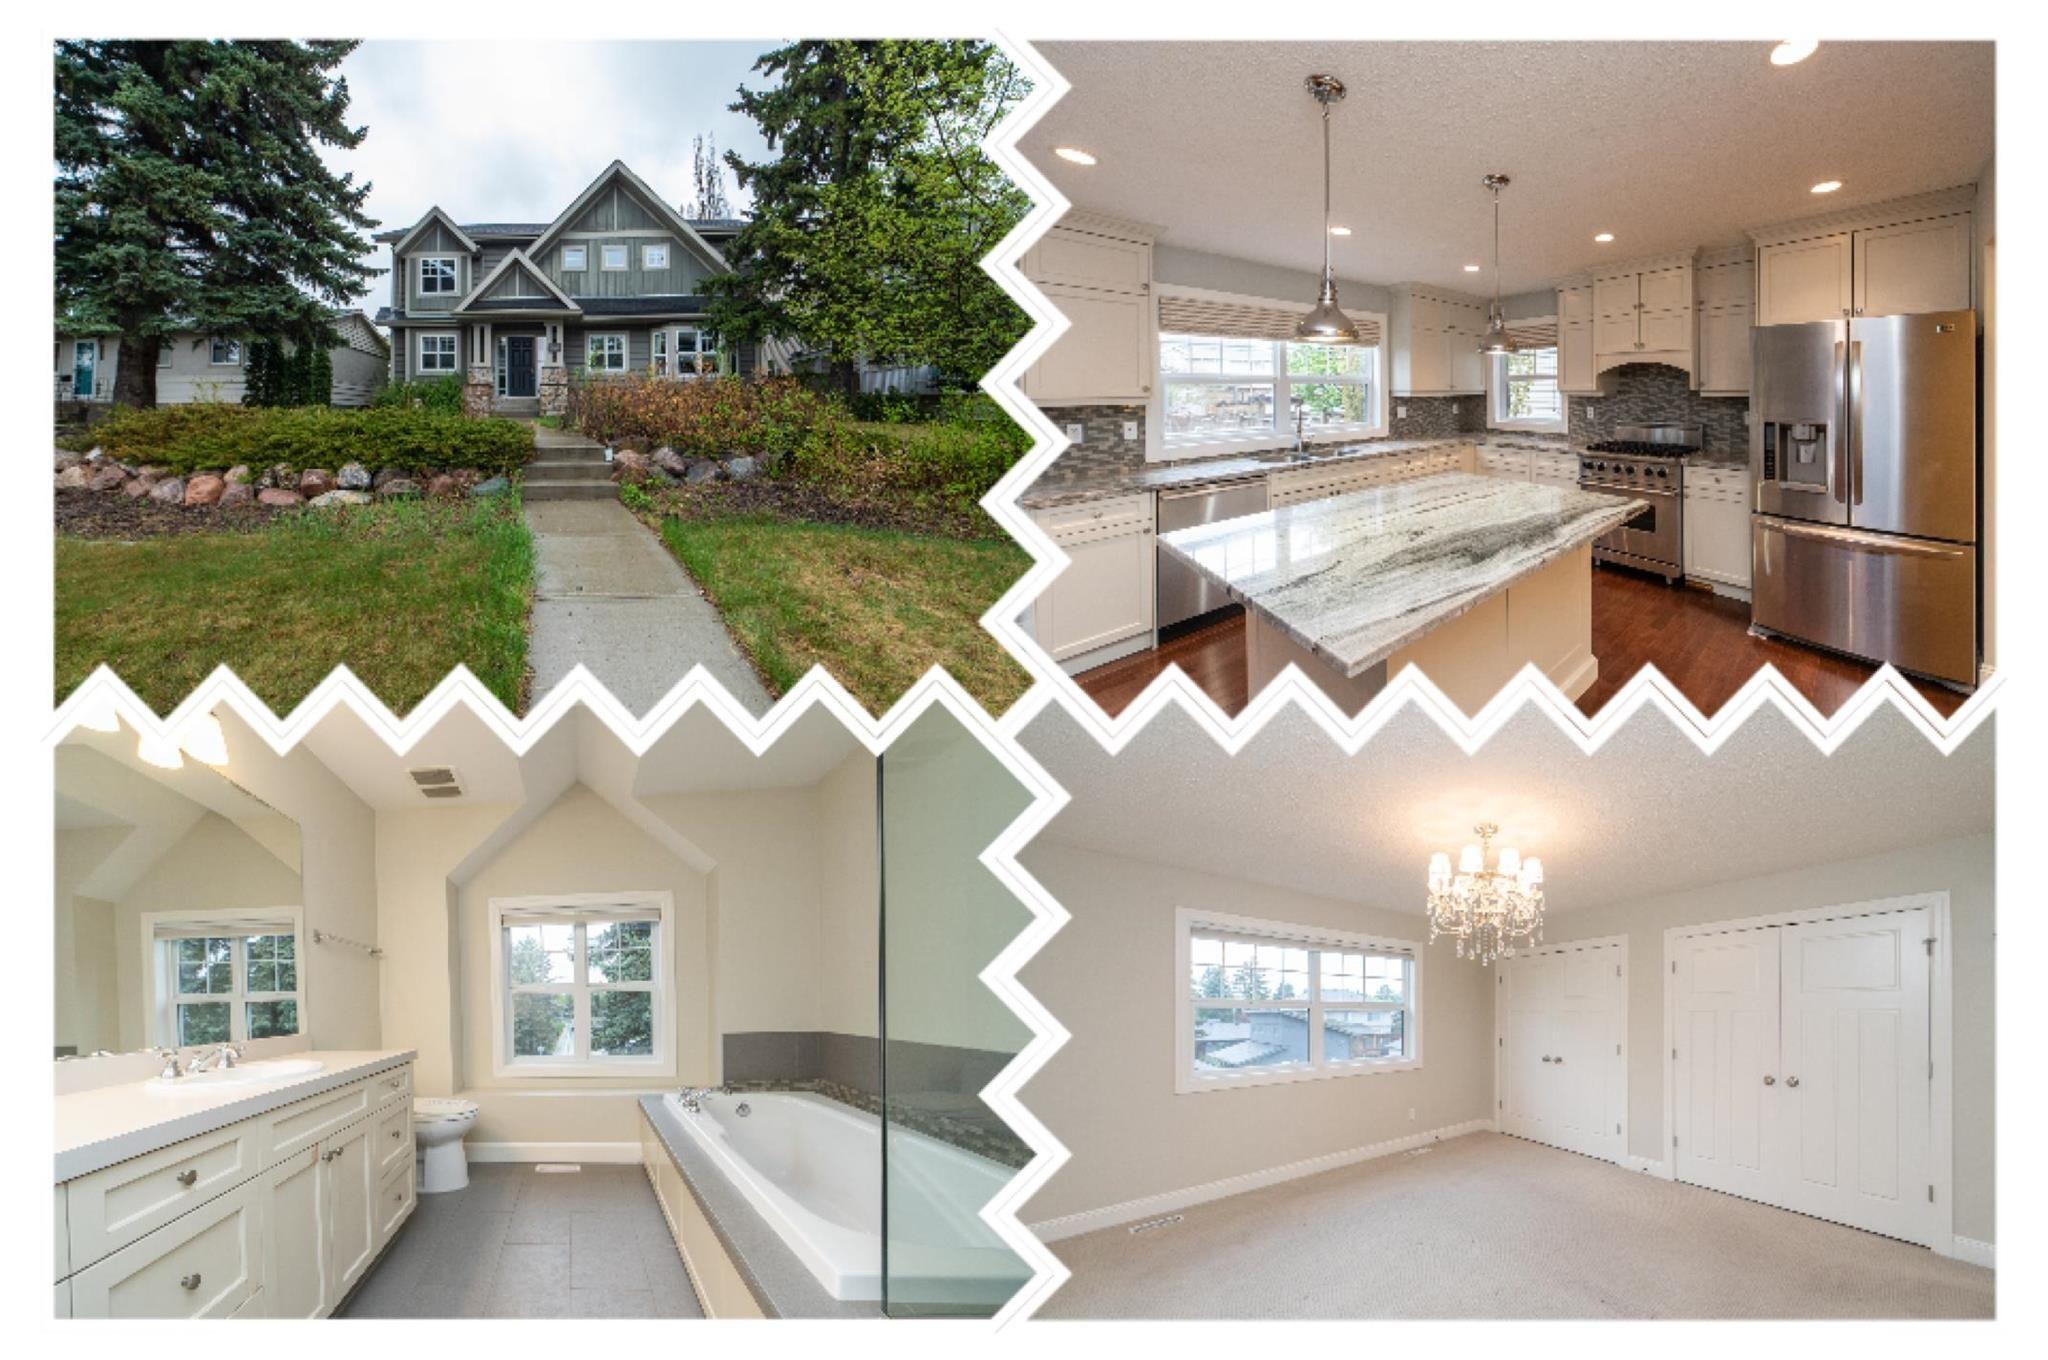 Main Photo: 8951 147 Street in Edmonton: Zone 10 House for sale : MLS®# E4245484